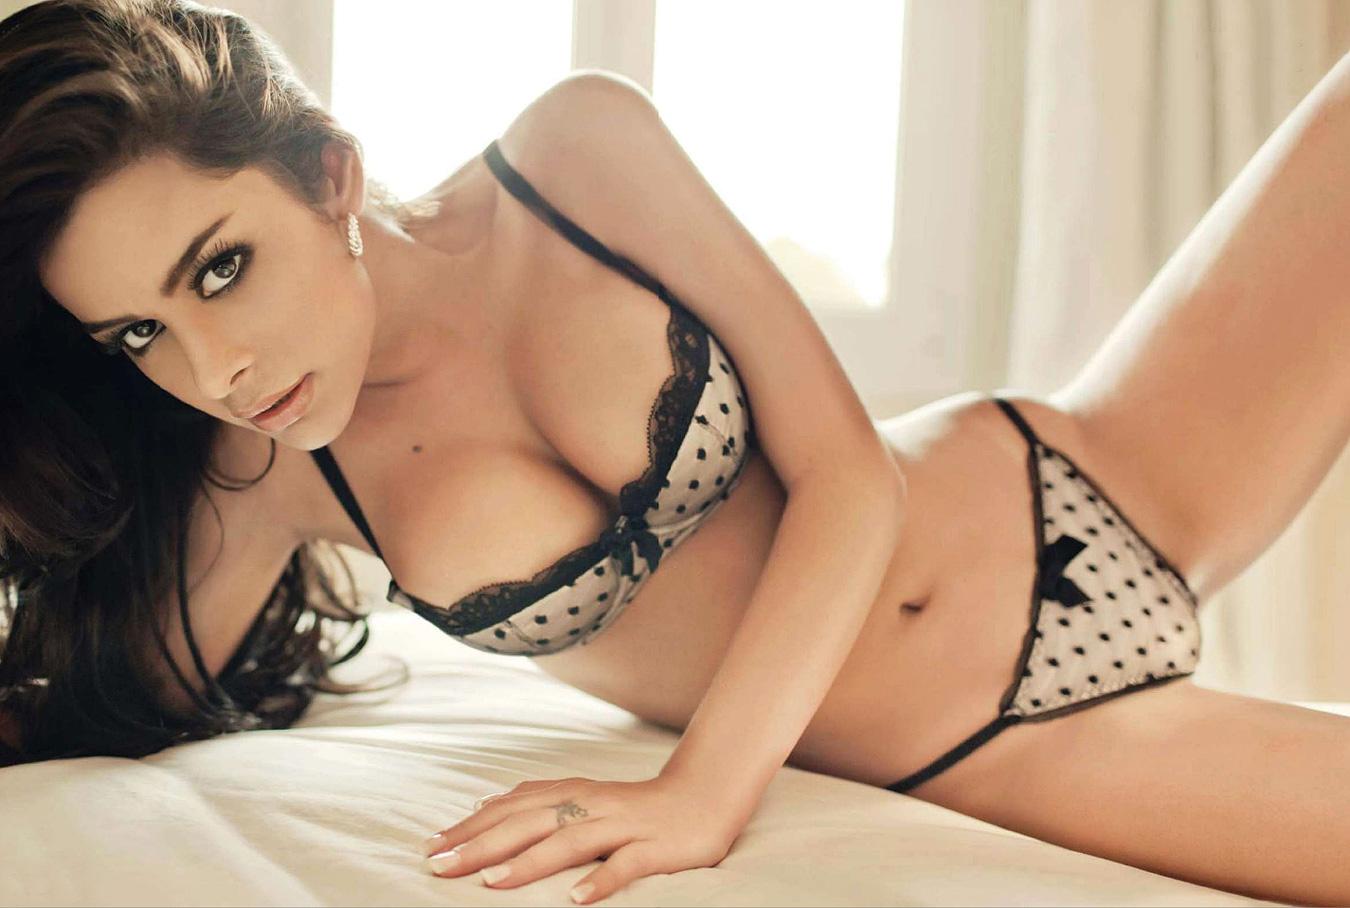 Snapchat Larissa Riquelme nude (94 foto and video), Sexy, Paparazzi, Boobs, braless 2018